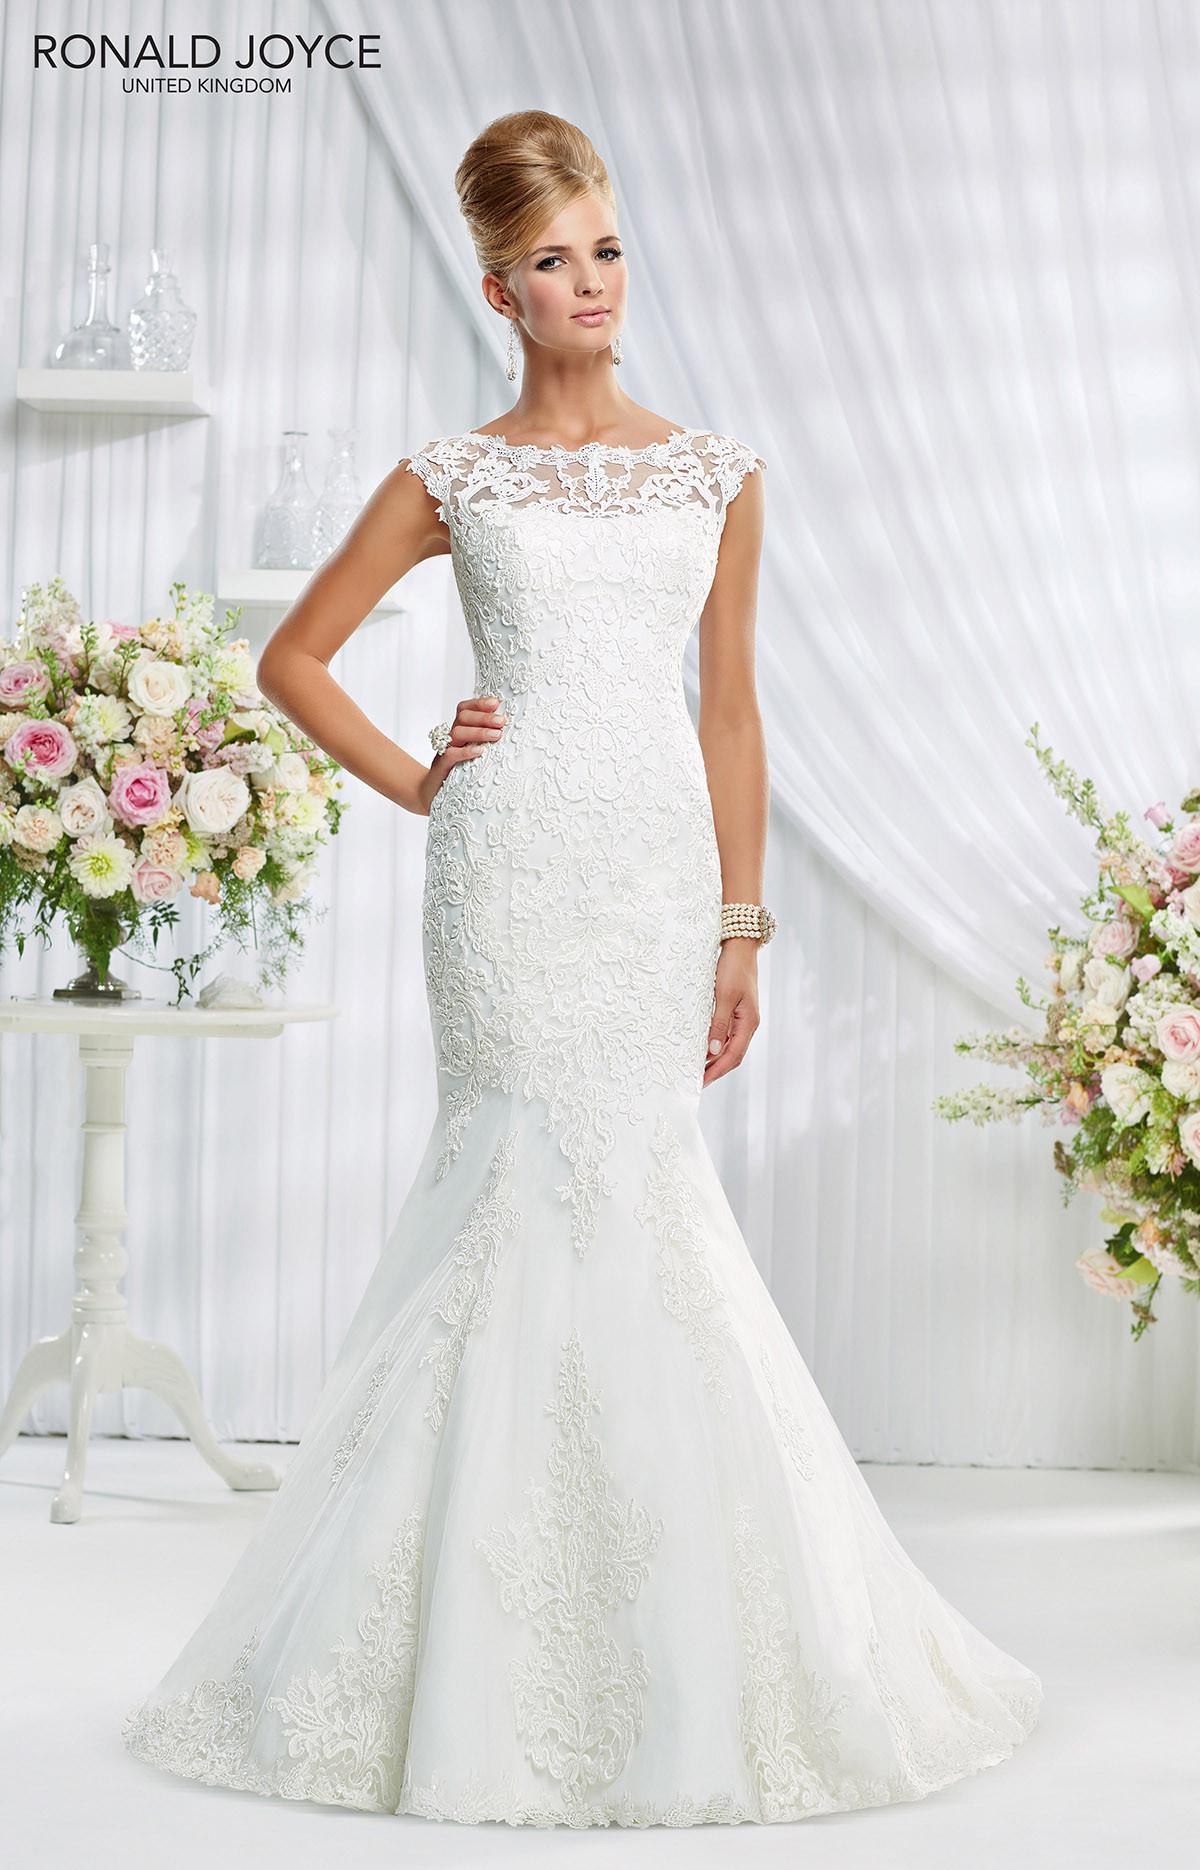 Ronald Joyce Bridal gown Eleanor 69013